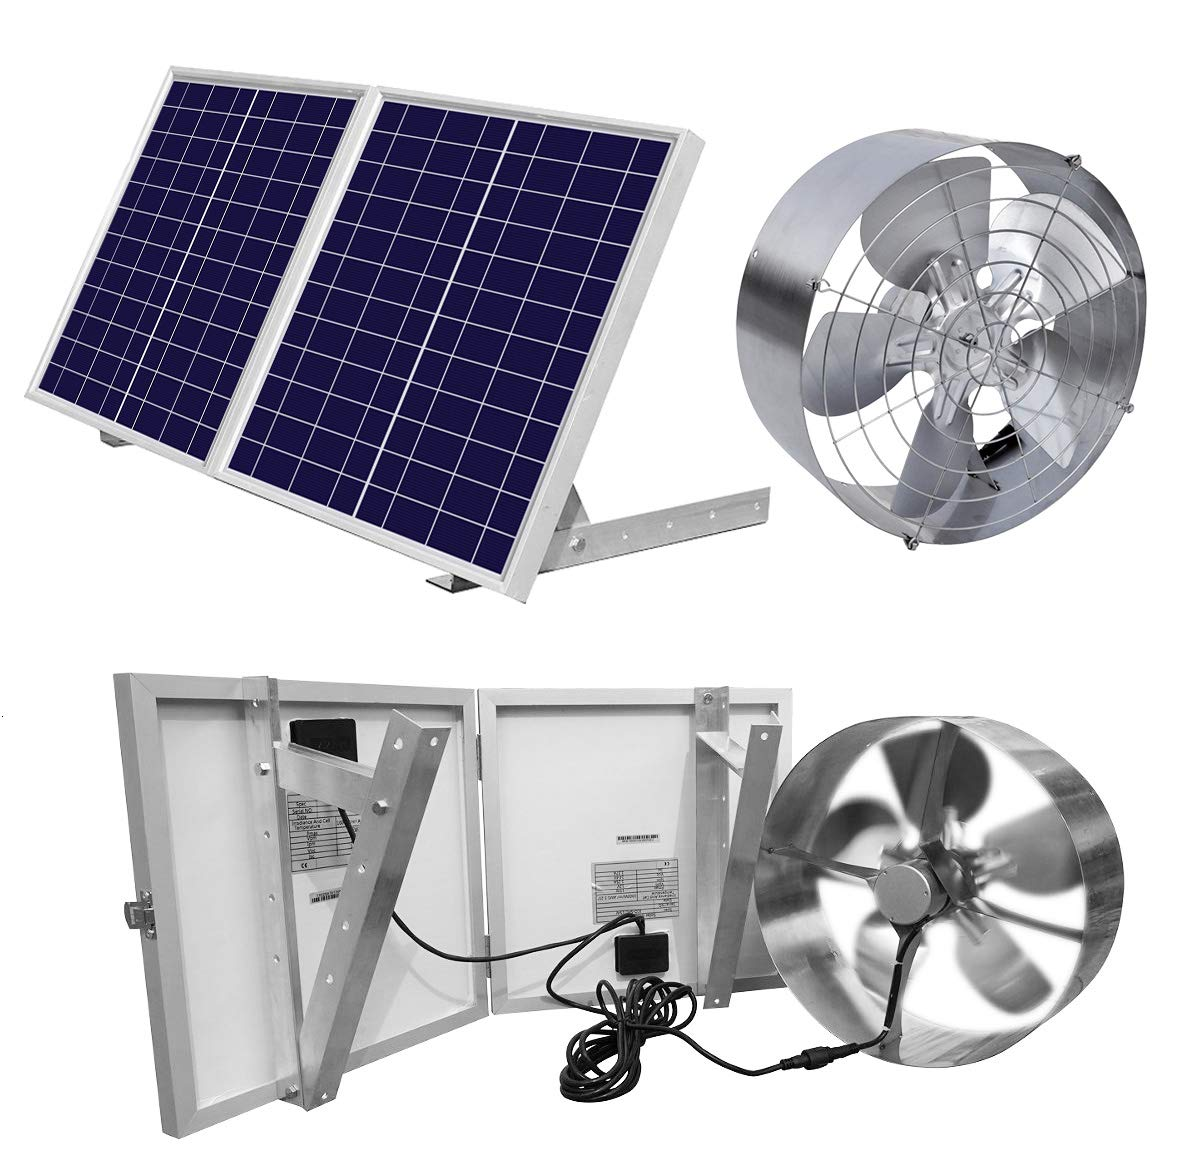 Solar Powered Attic Ventilator Gable Roof Vent Fan